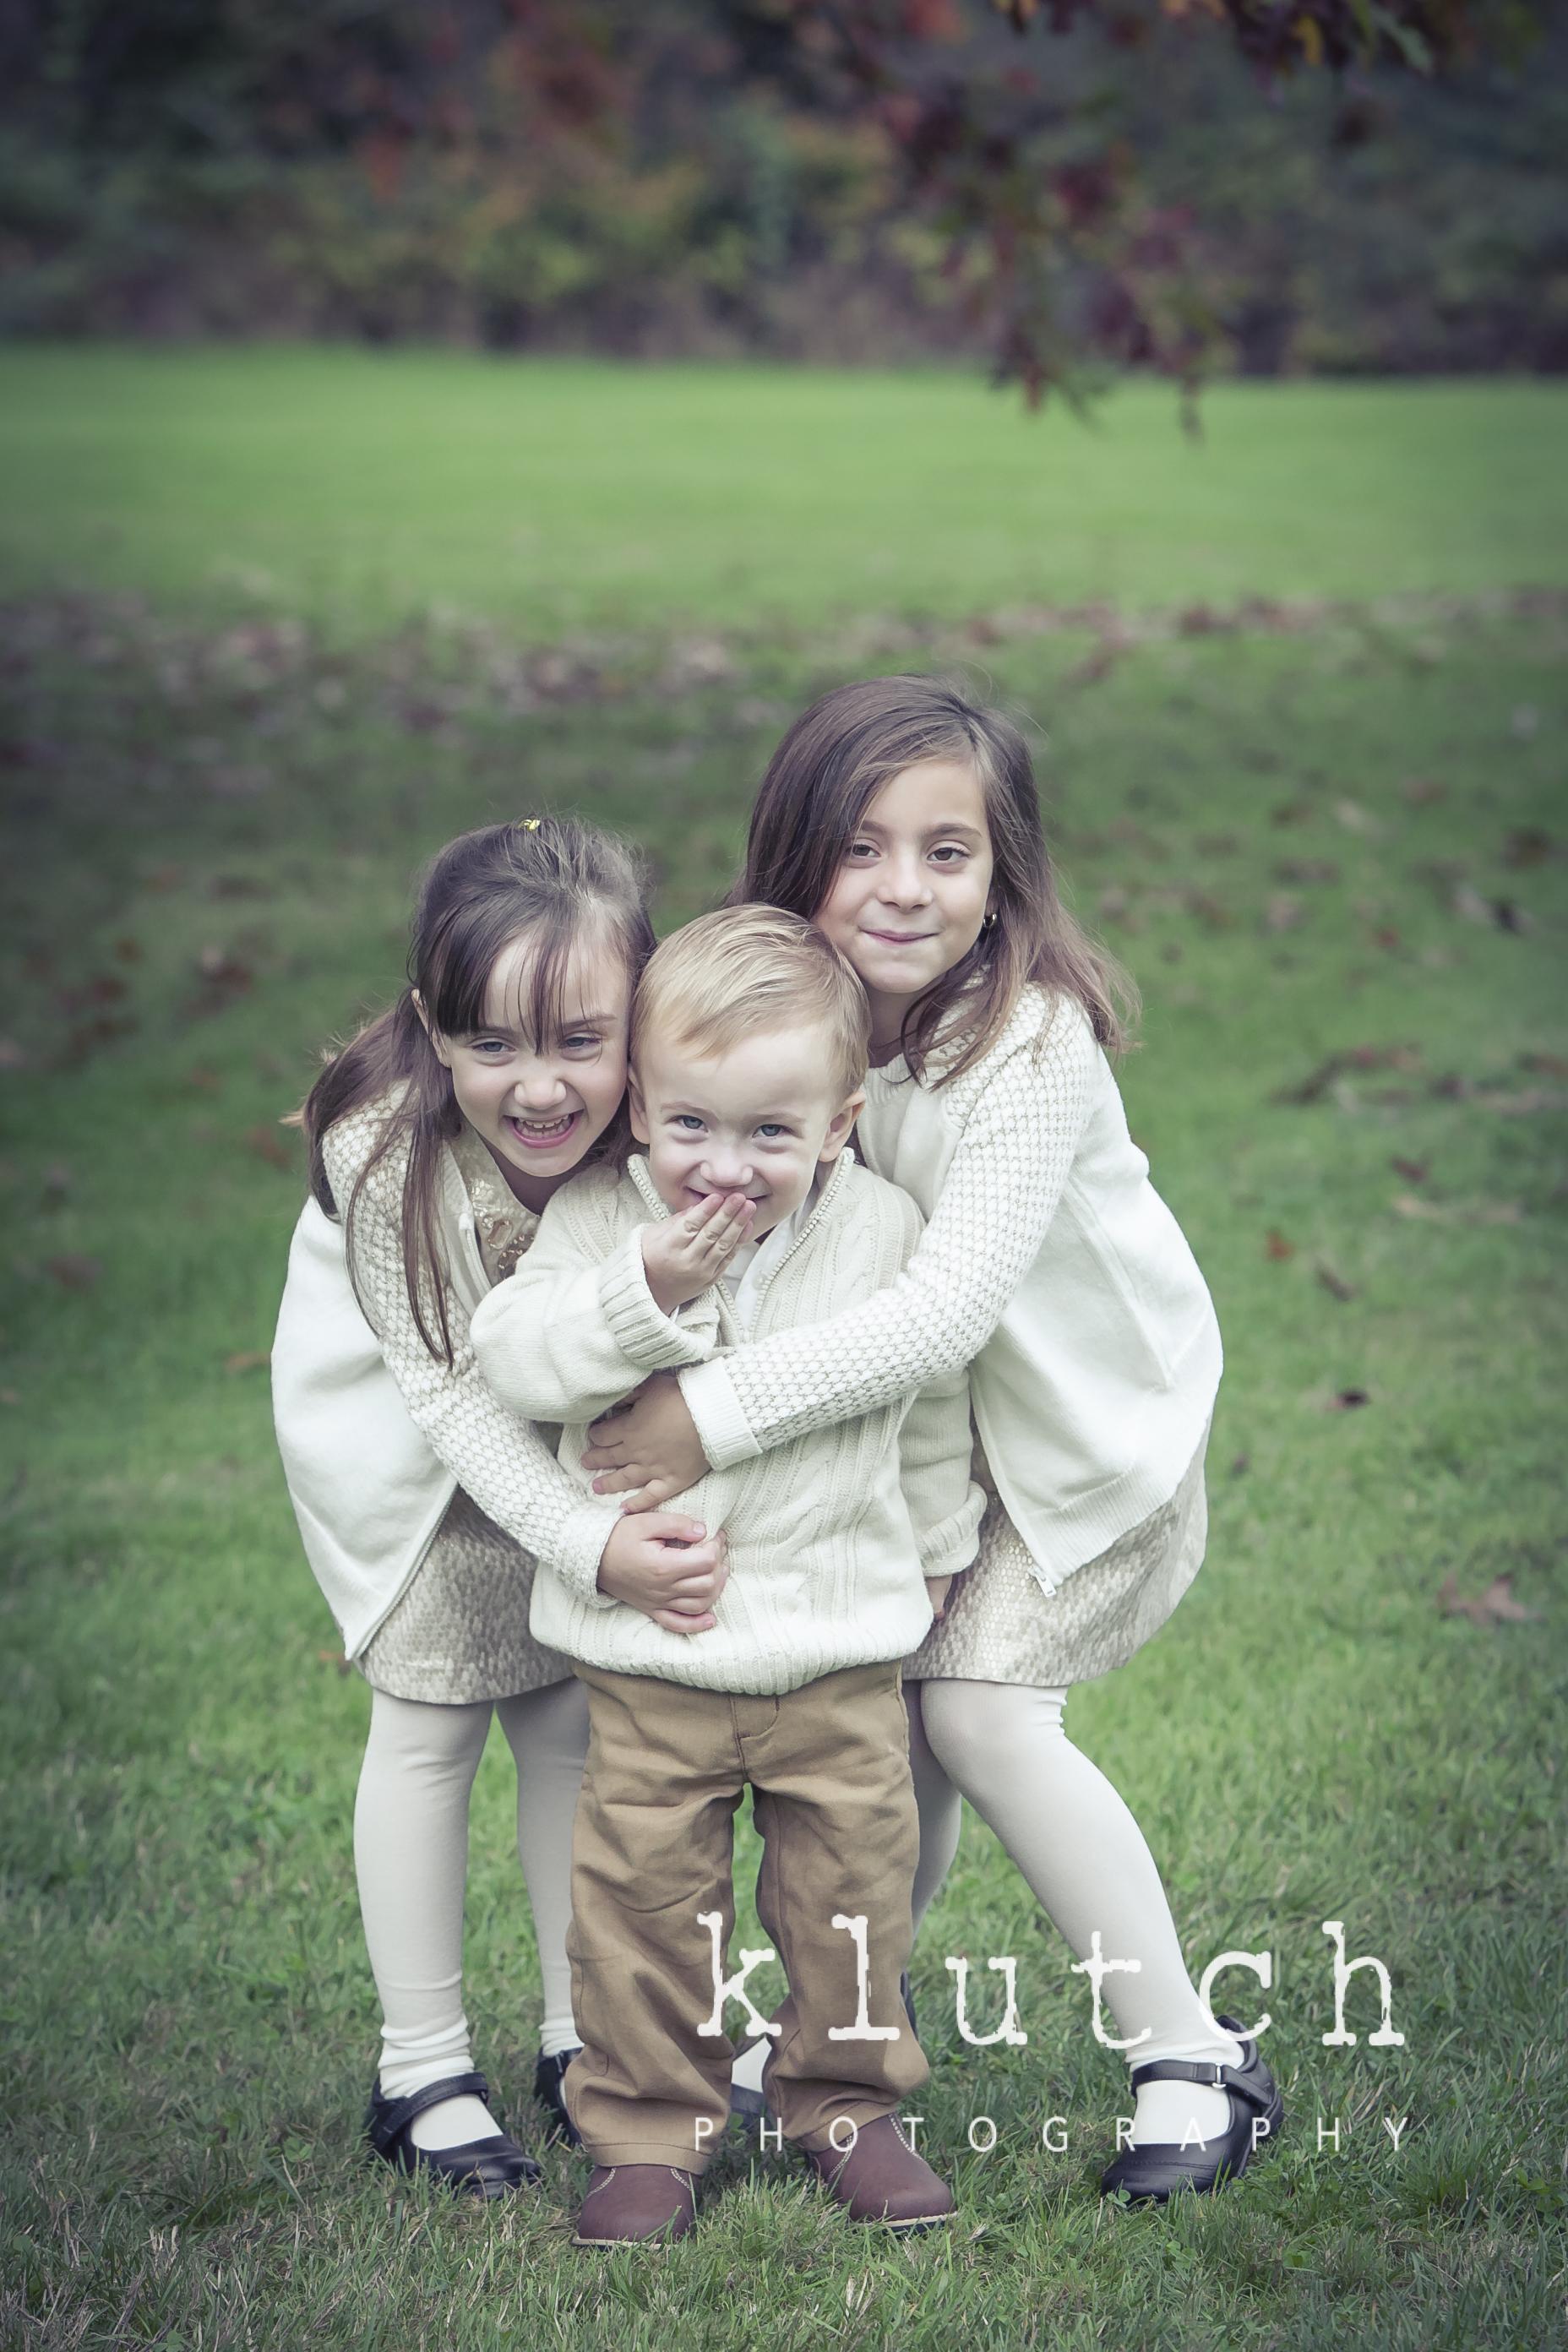 Klutch Photography,white rock family photographer, vancouver family photographer, whiterock lifestyle photographer, life unscripted photographer, life unscripted session, photography,Dina Ferreira Stoddard-110.jpg